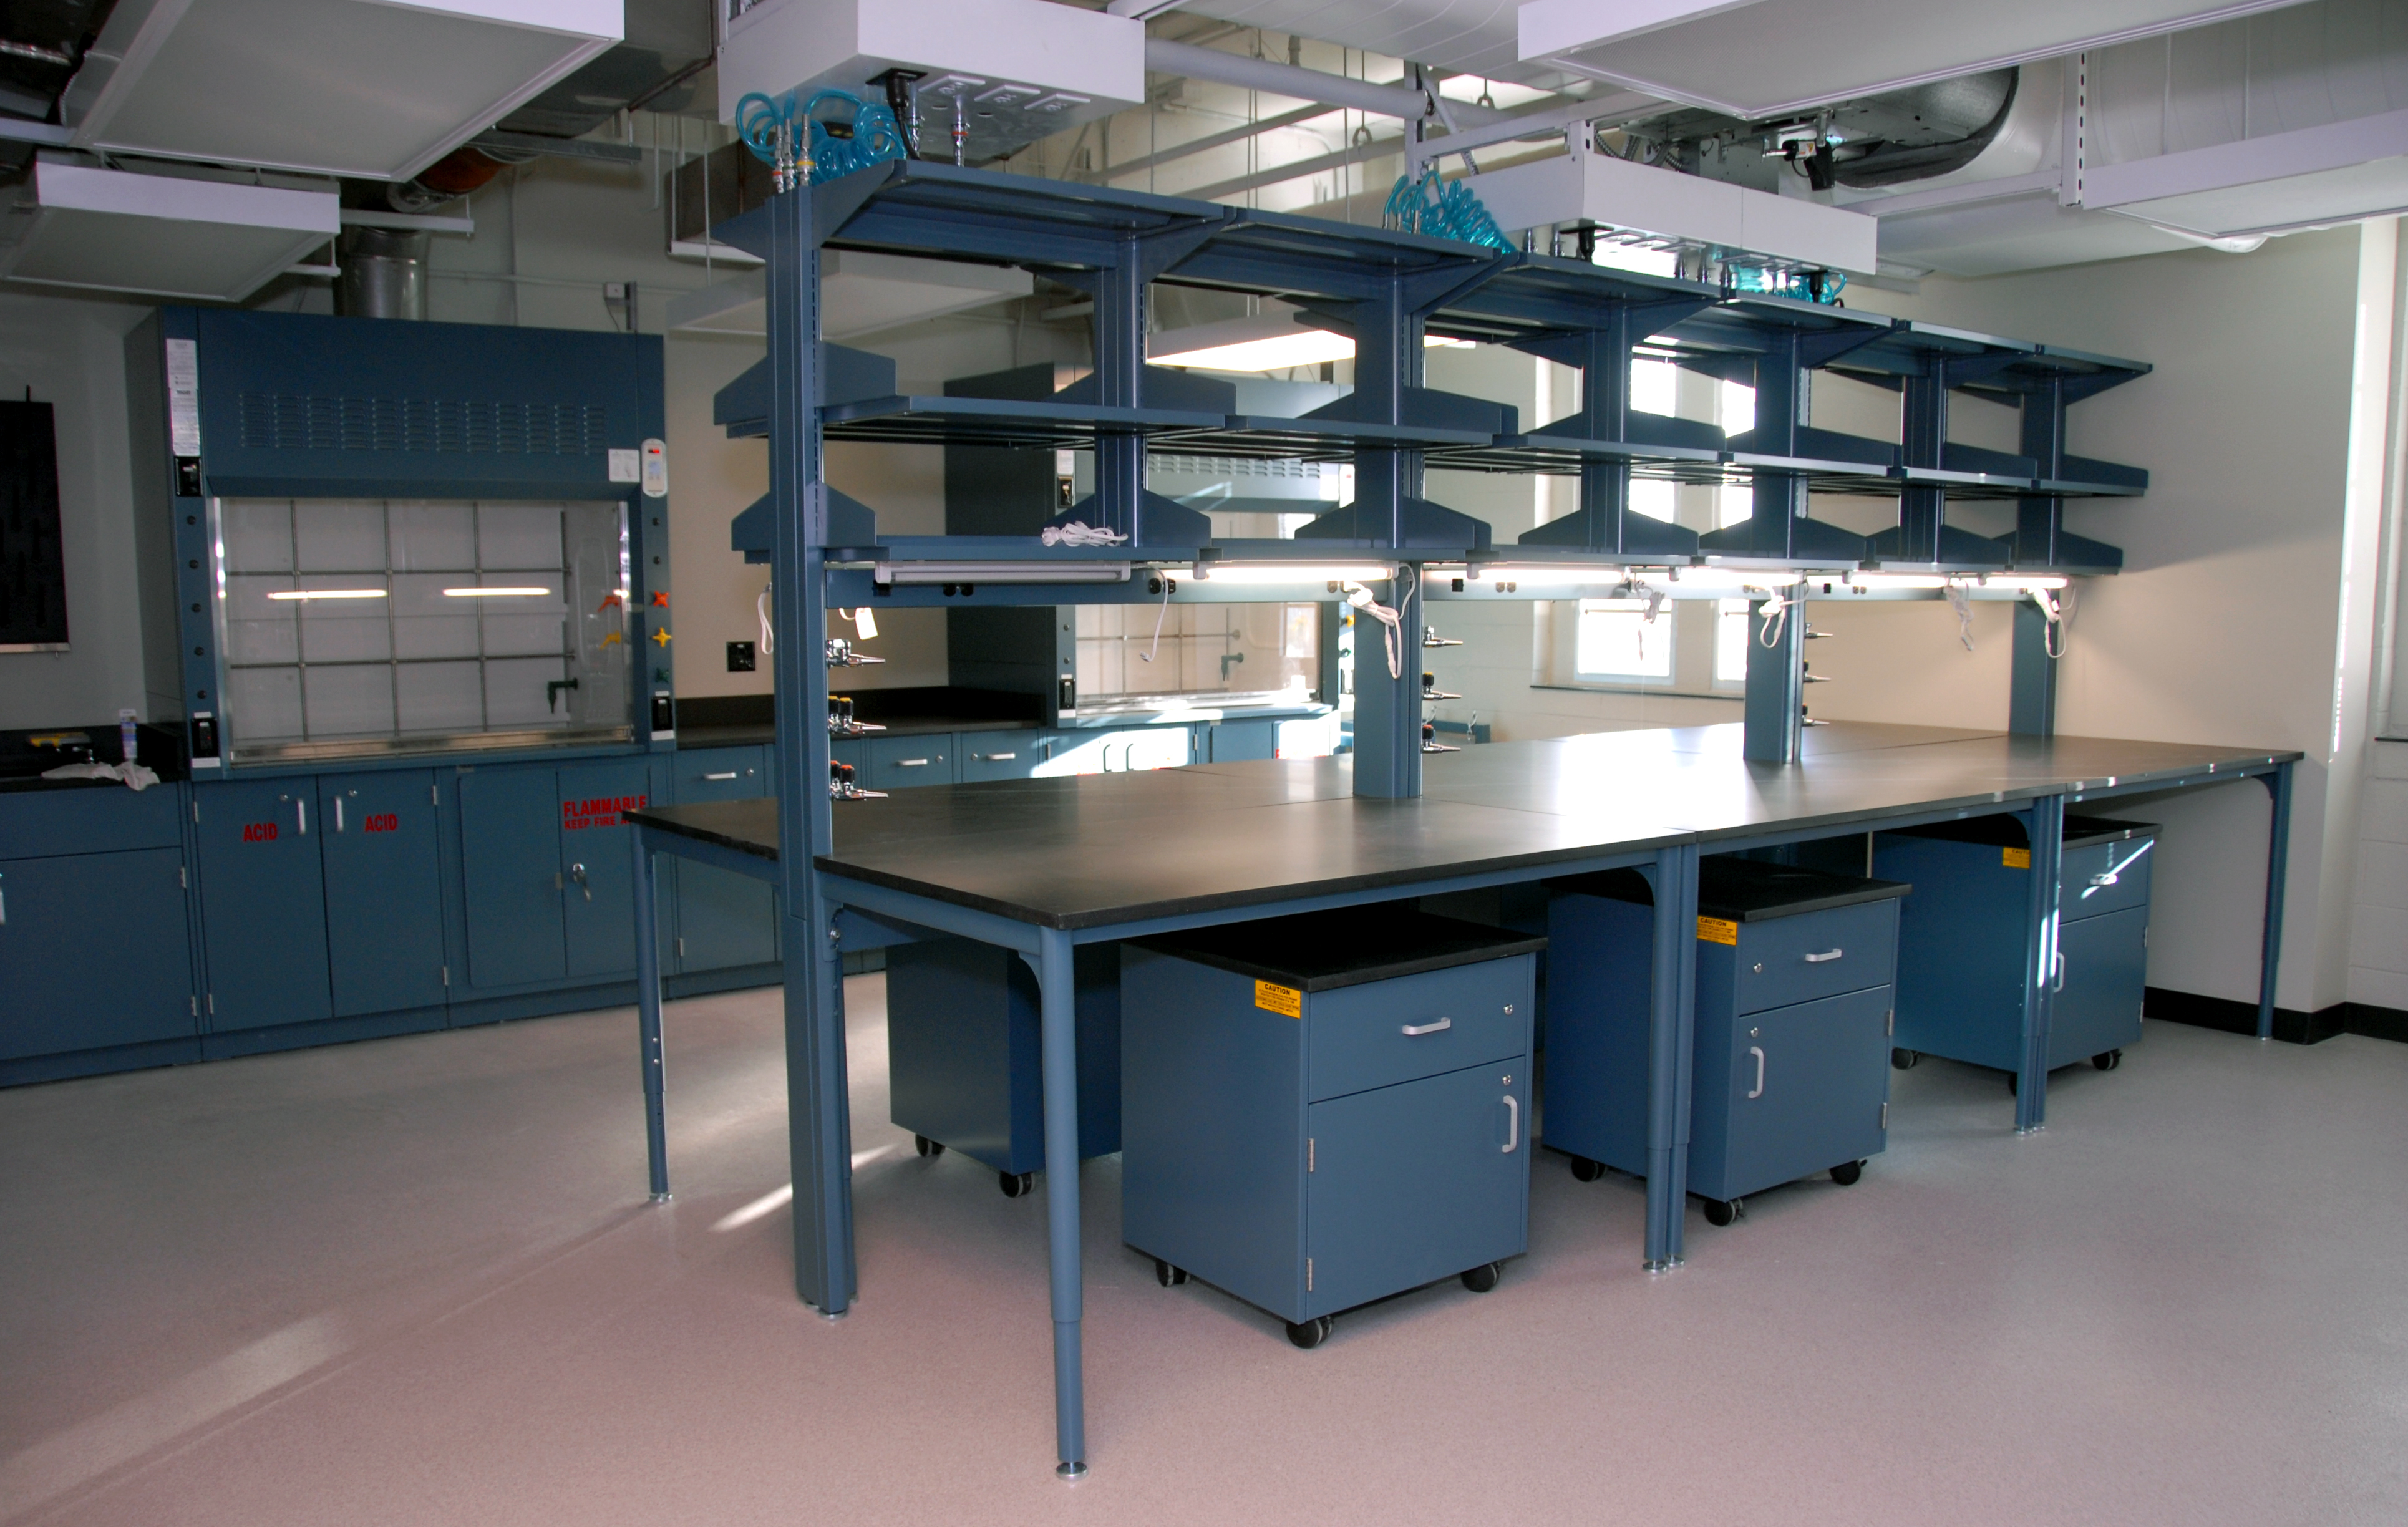 UT Buehler Lab/Dougherty Lab 324